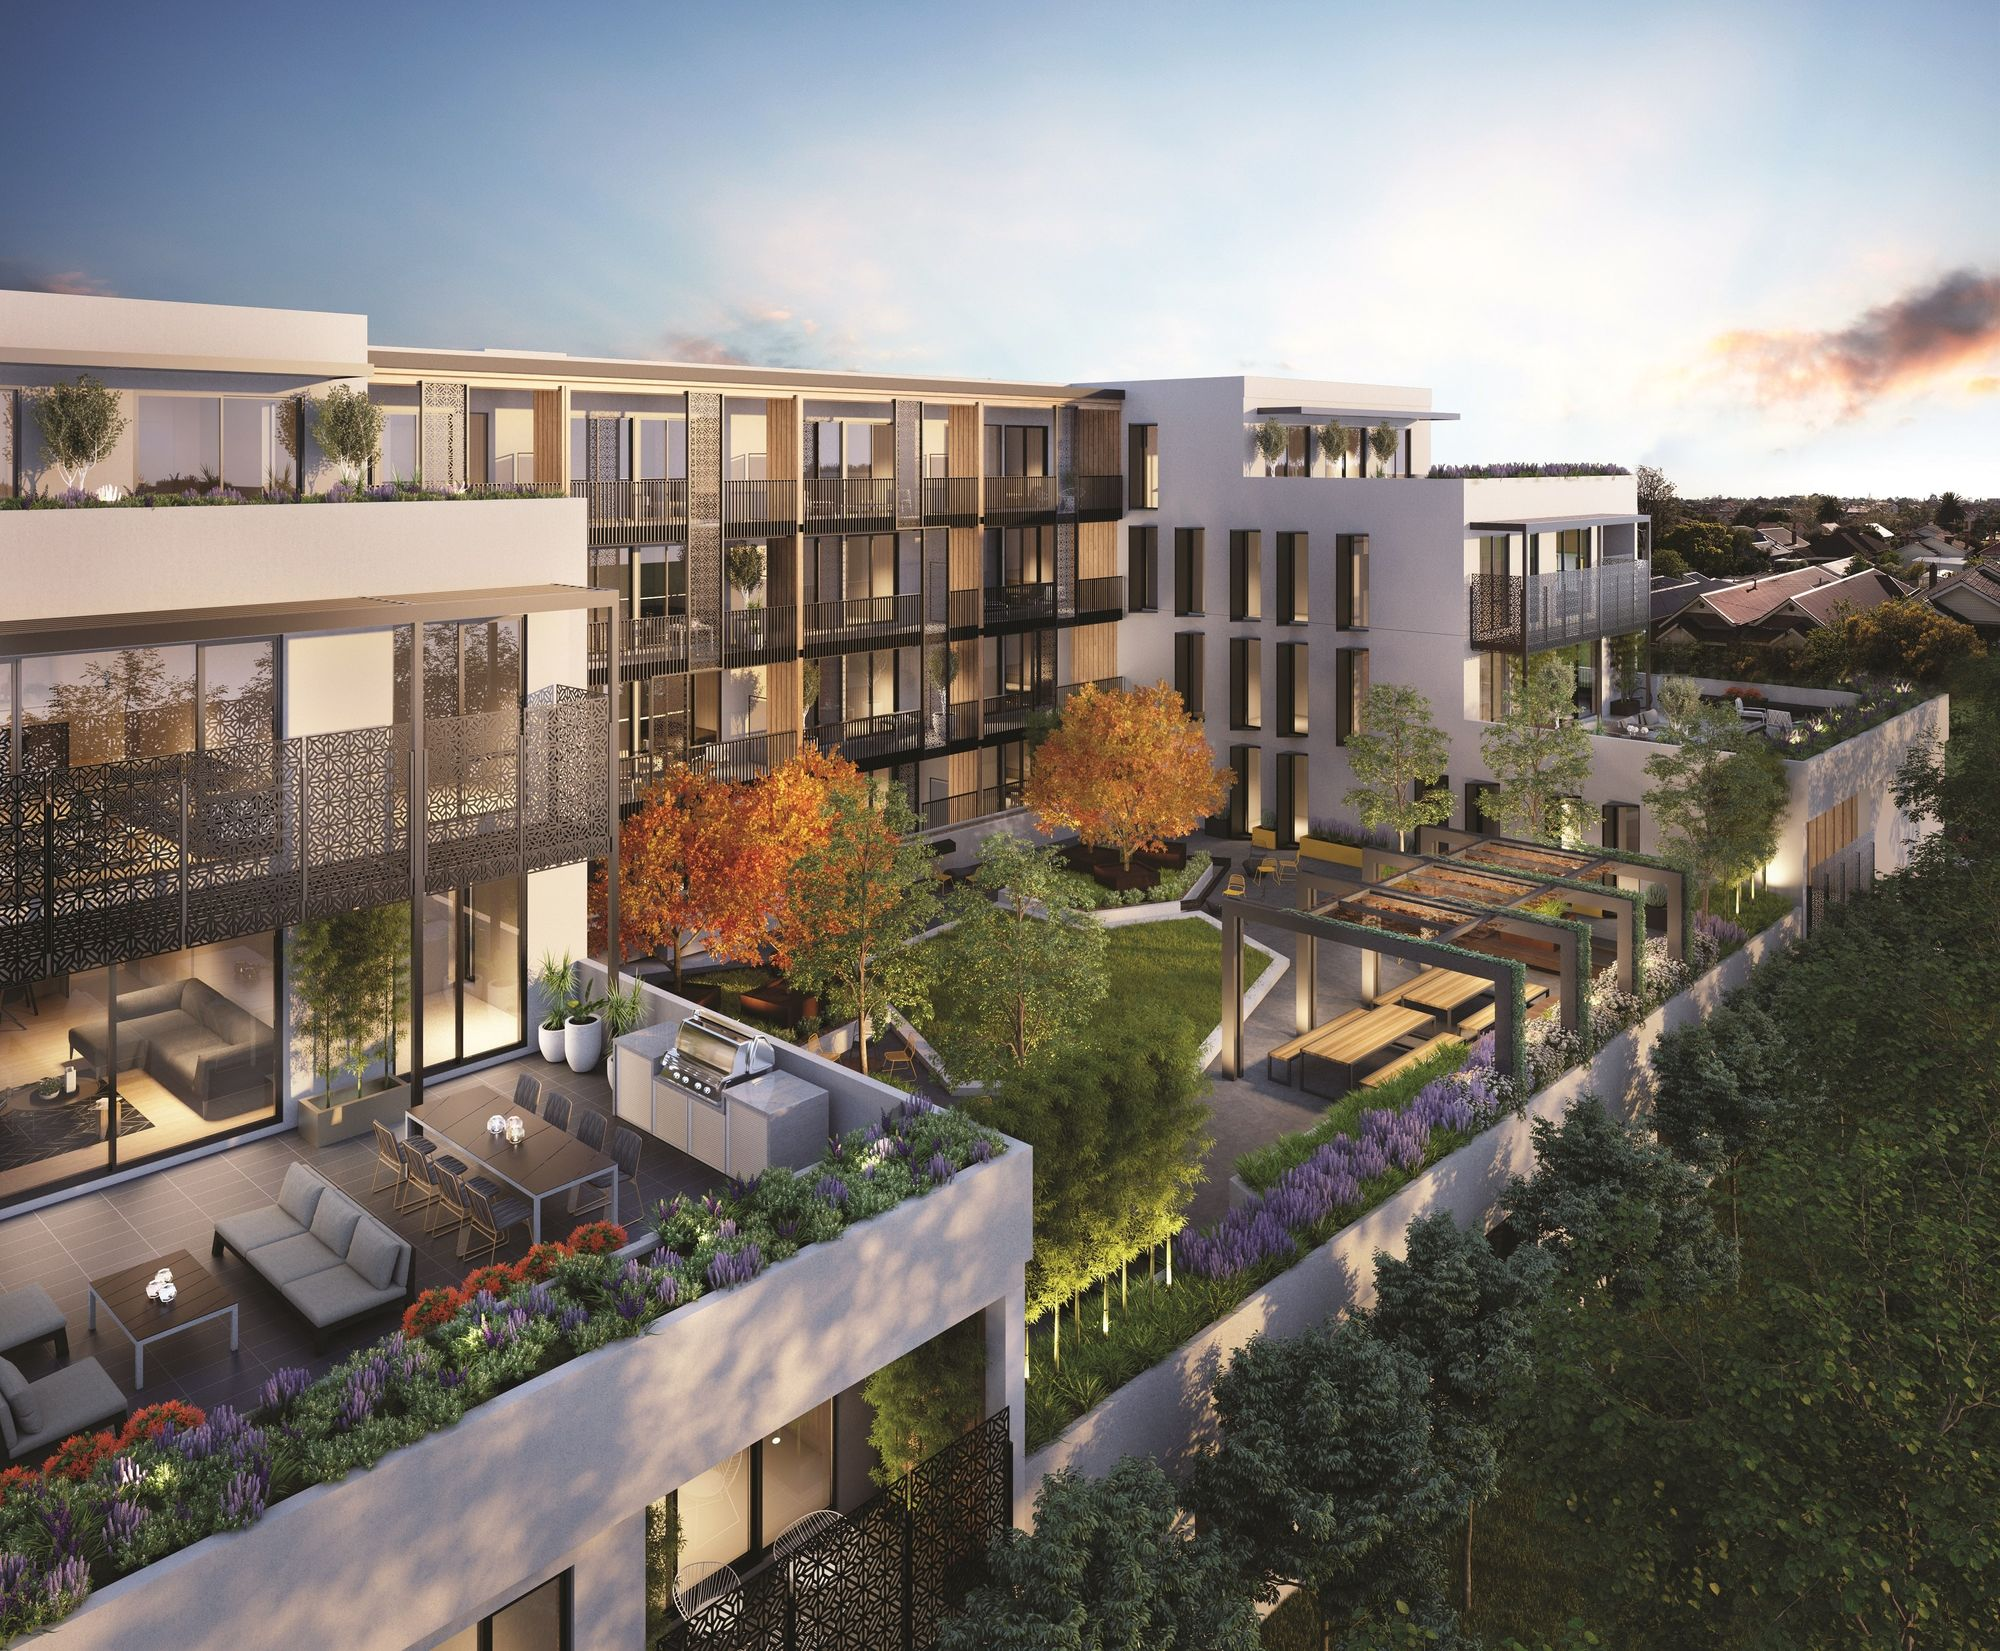 Apartment, Community, Housing, Neighbors